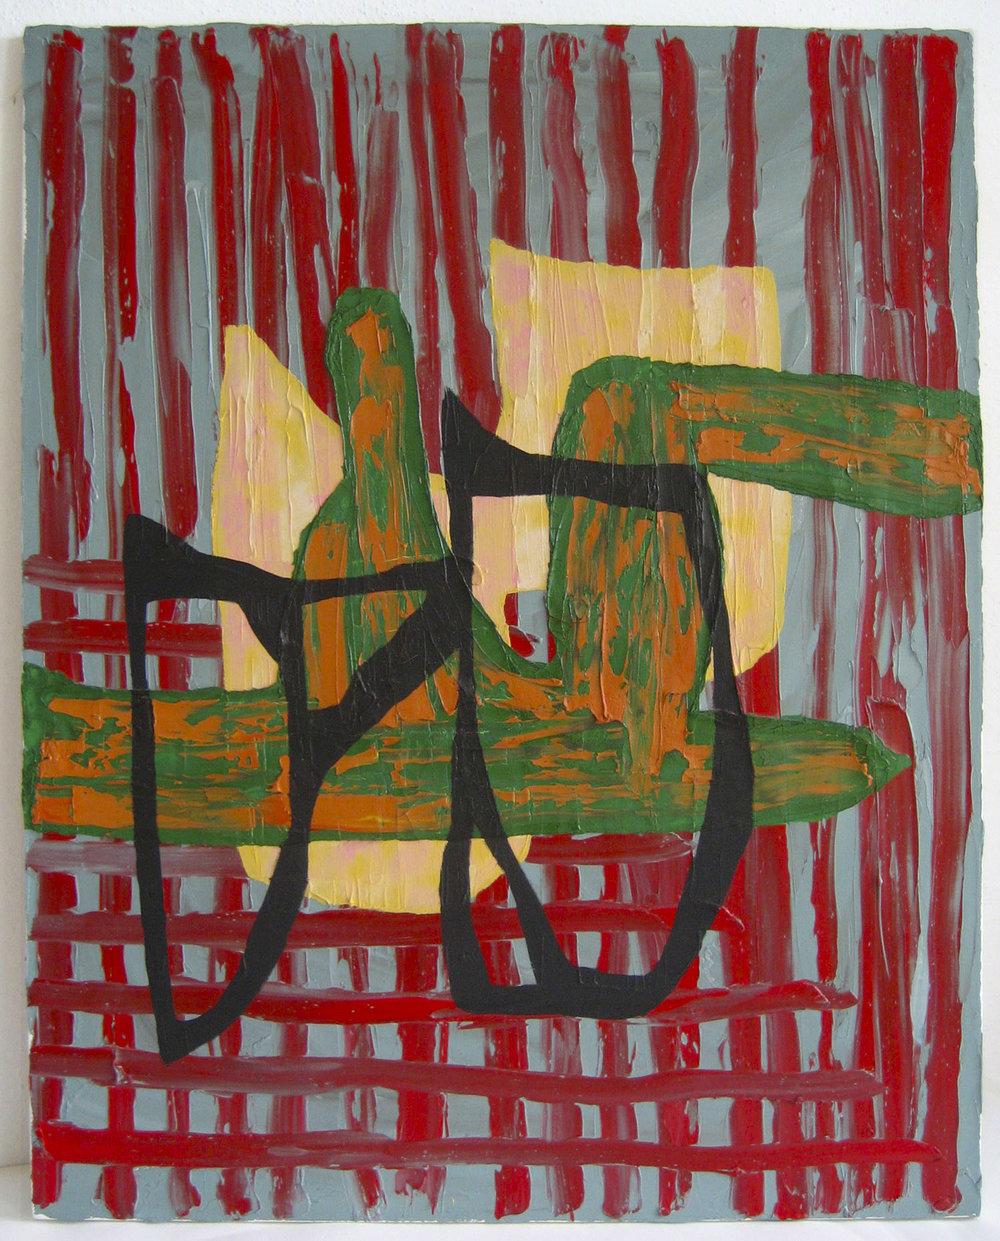 Gingham | 1984 | Öl auf Leinwand | 77 x 61 cm